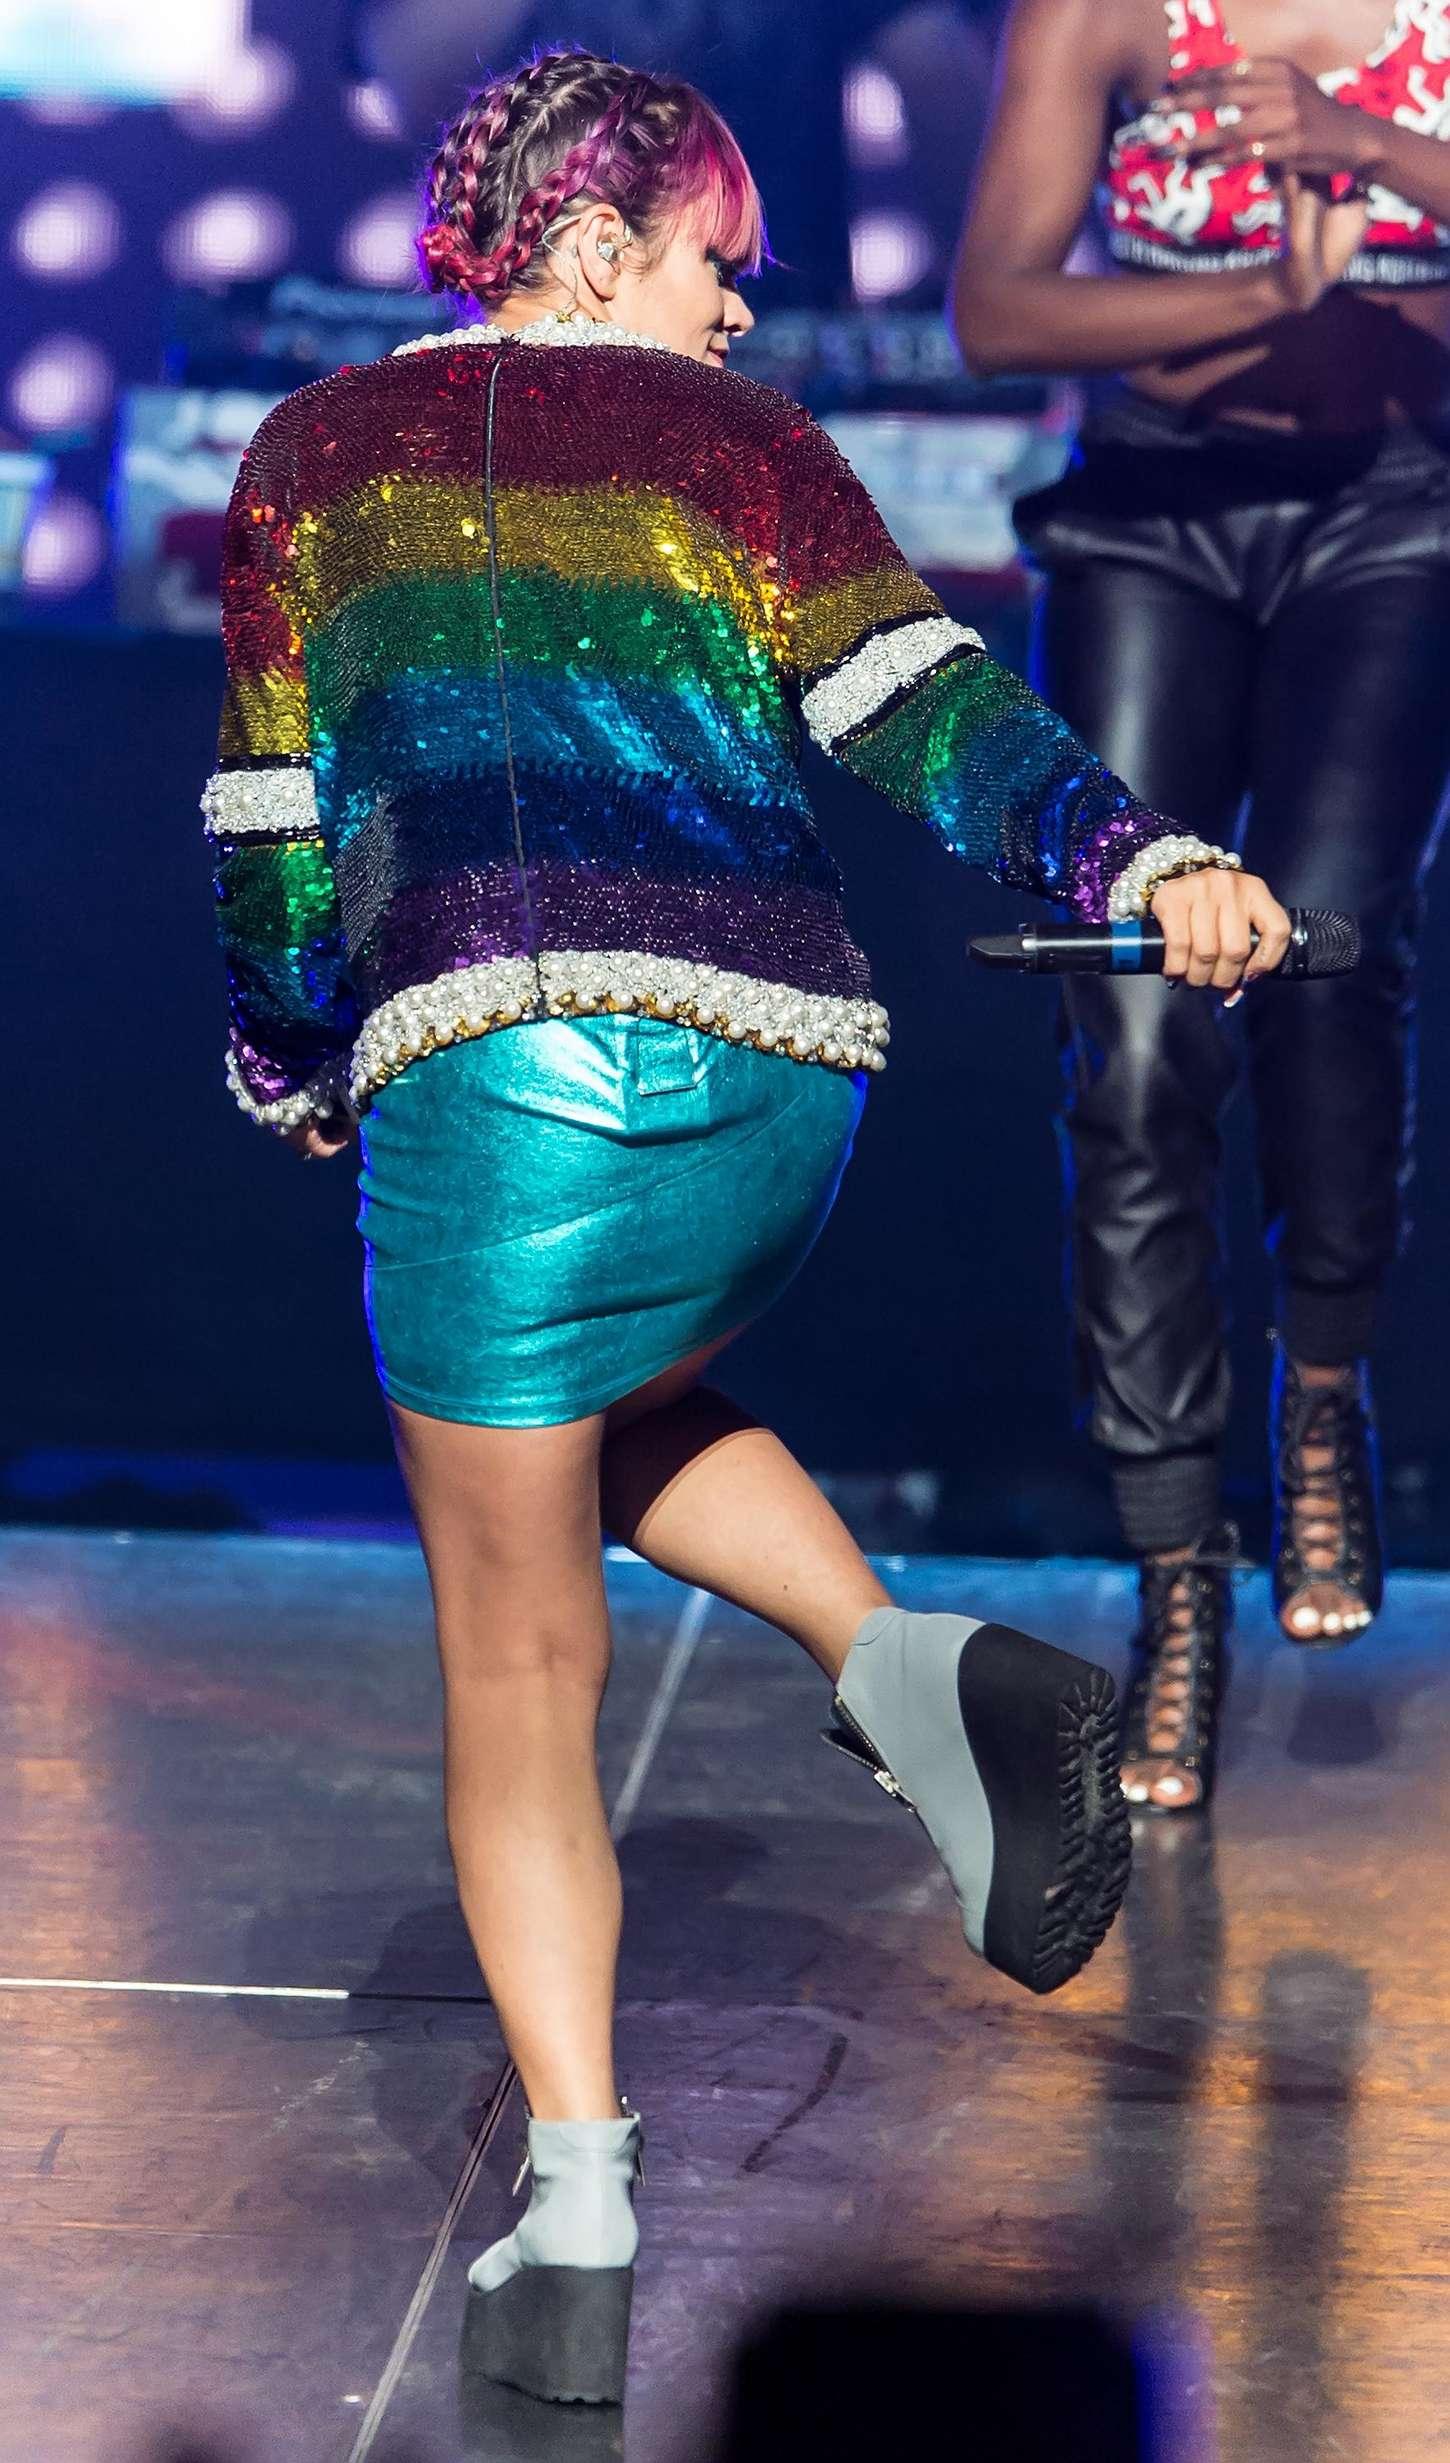 Lily Allen 2014 : Lily Allen Performs Live in Philadelphia -11